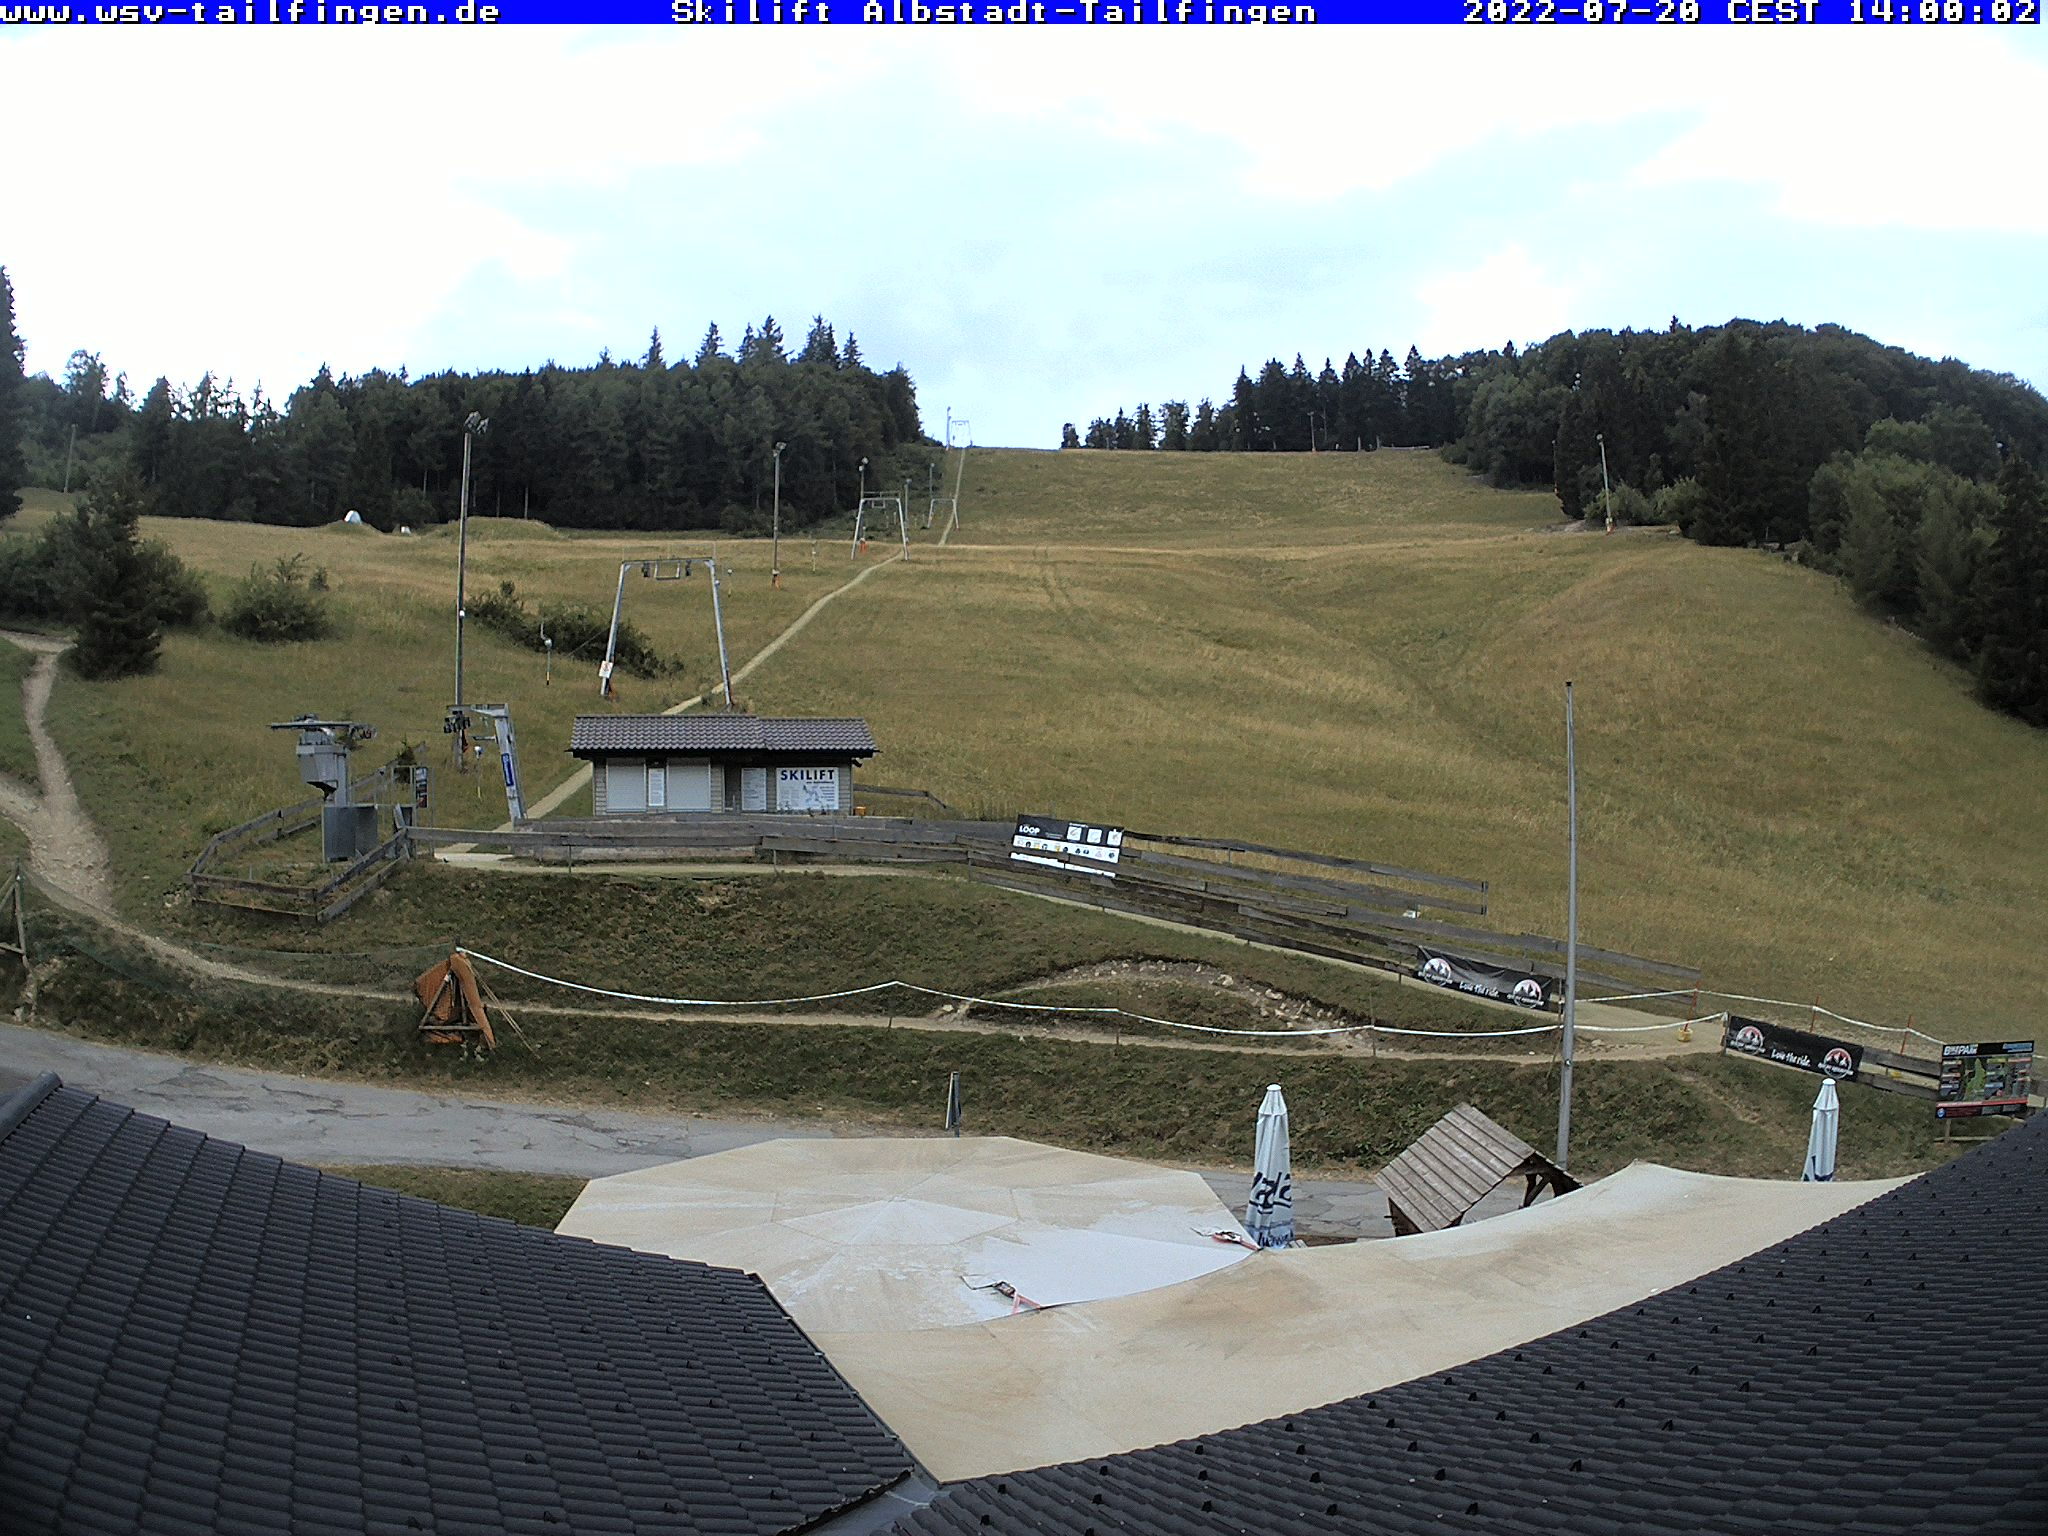 Webcam-Foto 14:00 Uhr / Skilift Albstadt-Tailfingen